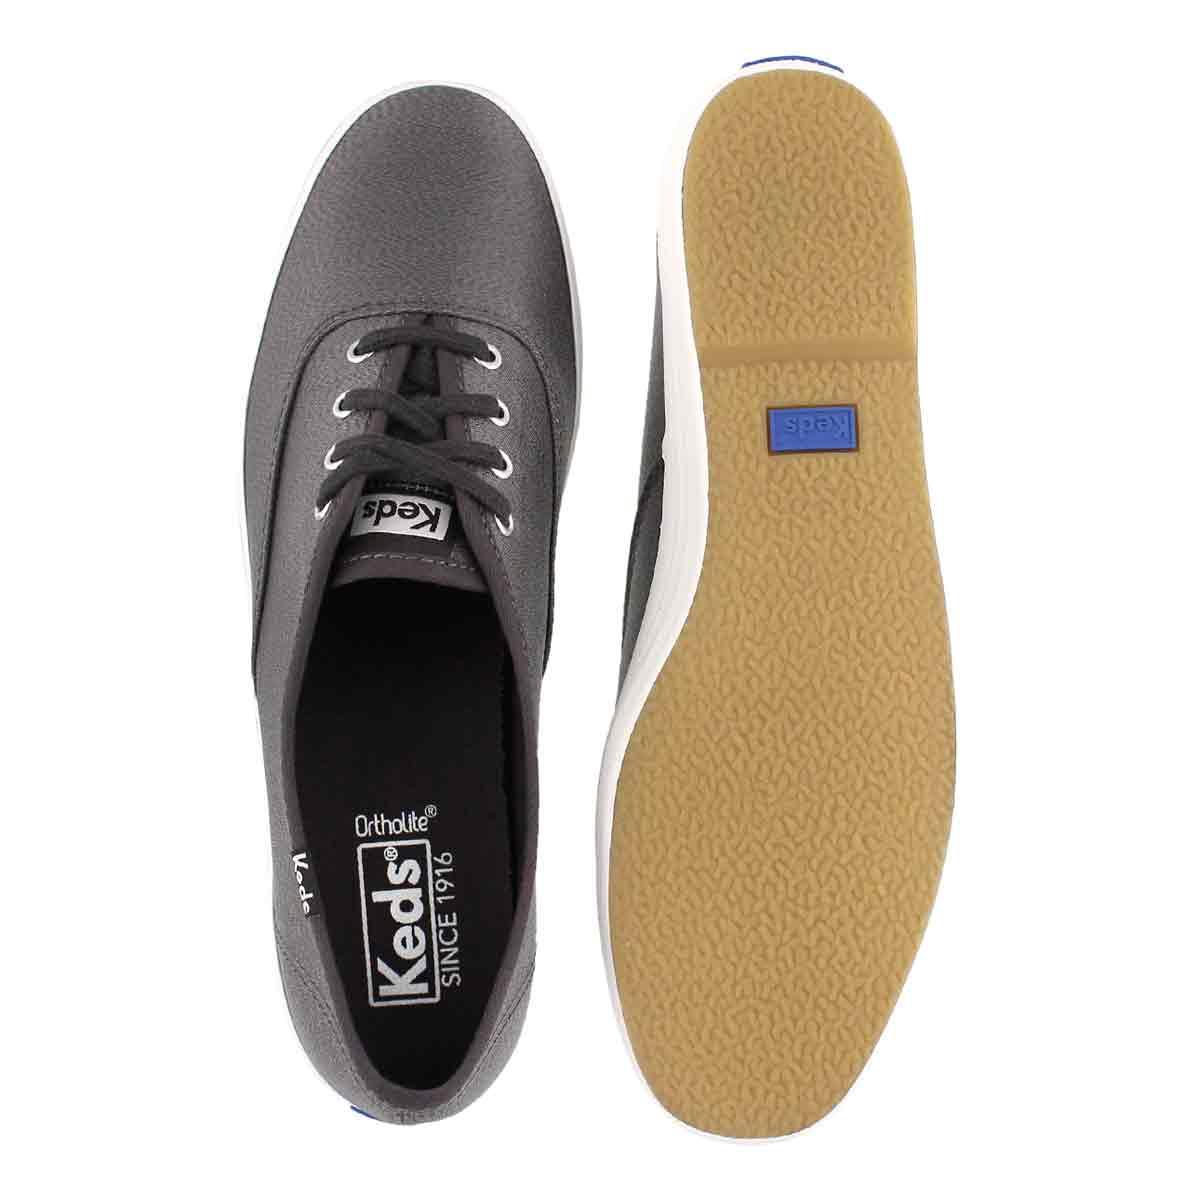 Lds Champion Lurex slate sneaker